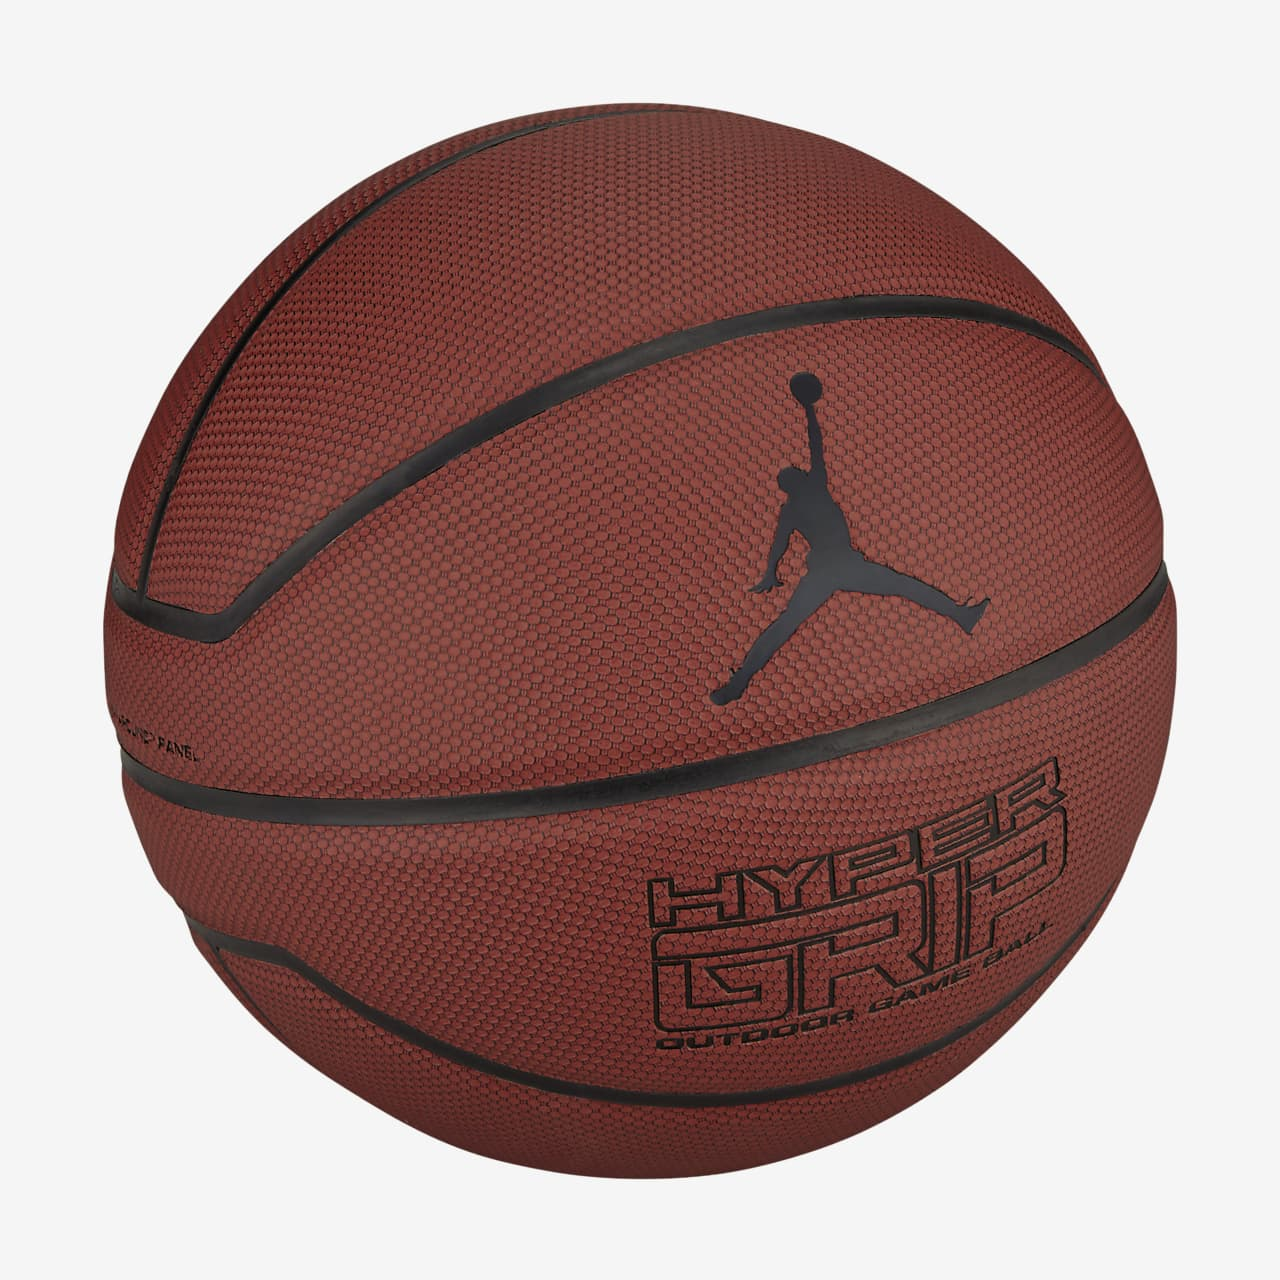 c03f8b2e Piłka do koszykówki Jordan HyperGrip 4P. Nike.com PL